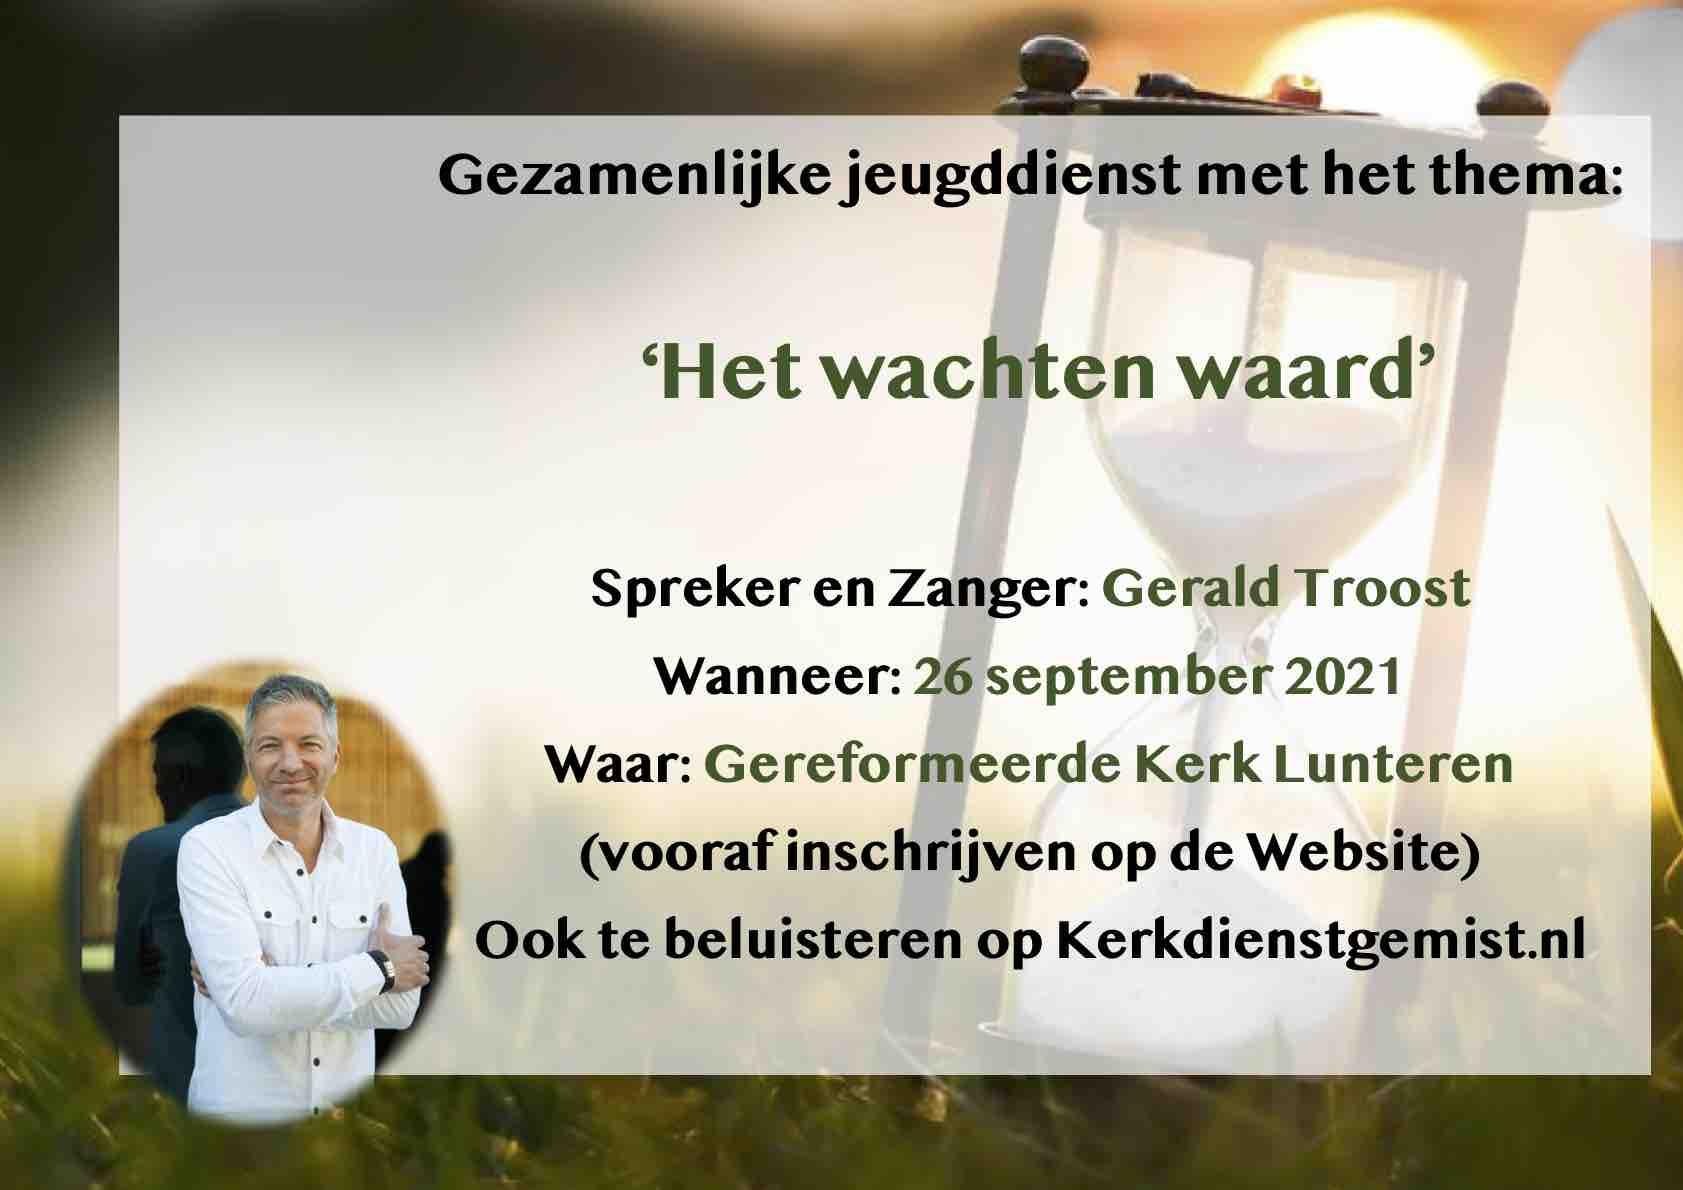 Kerkdienst 26 september @ Gereformeerde kerk | Lunteren | Gelderland | Nederland